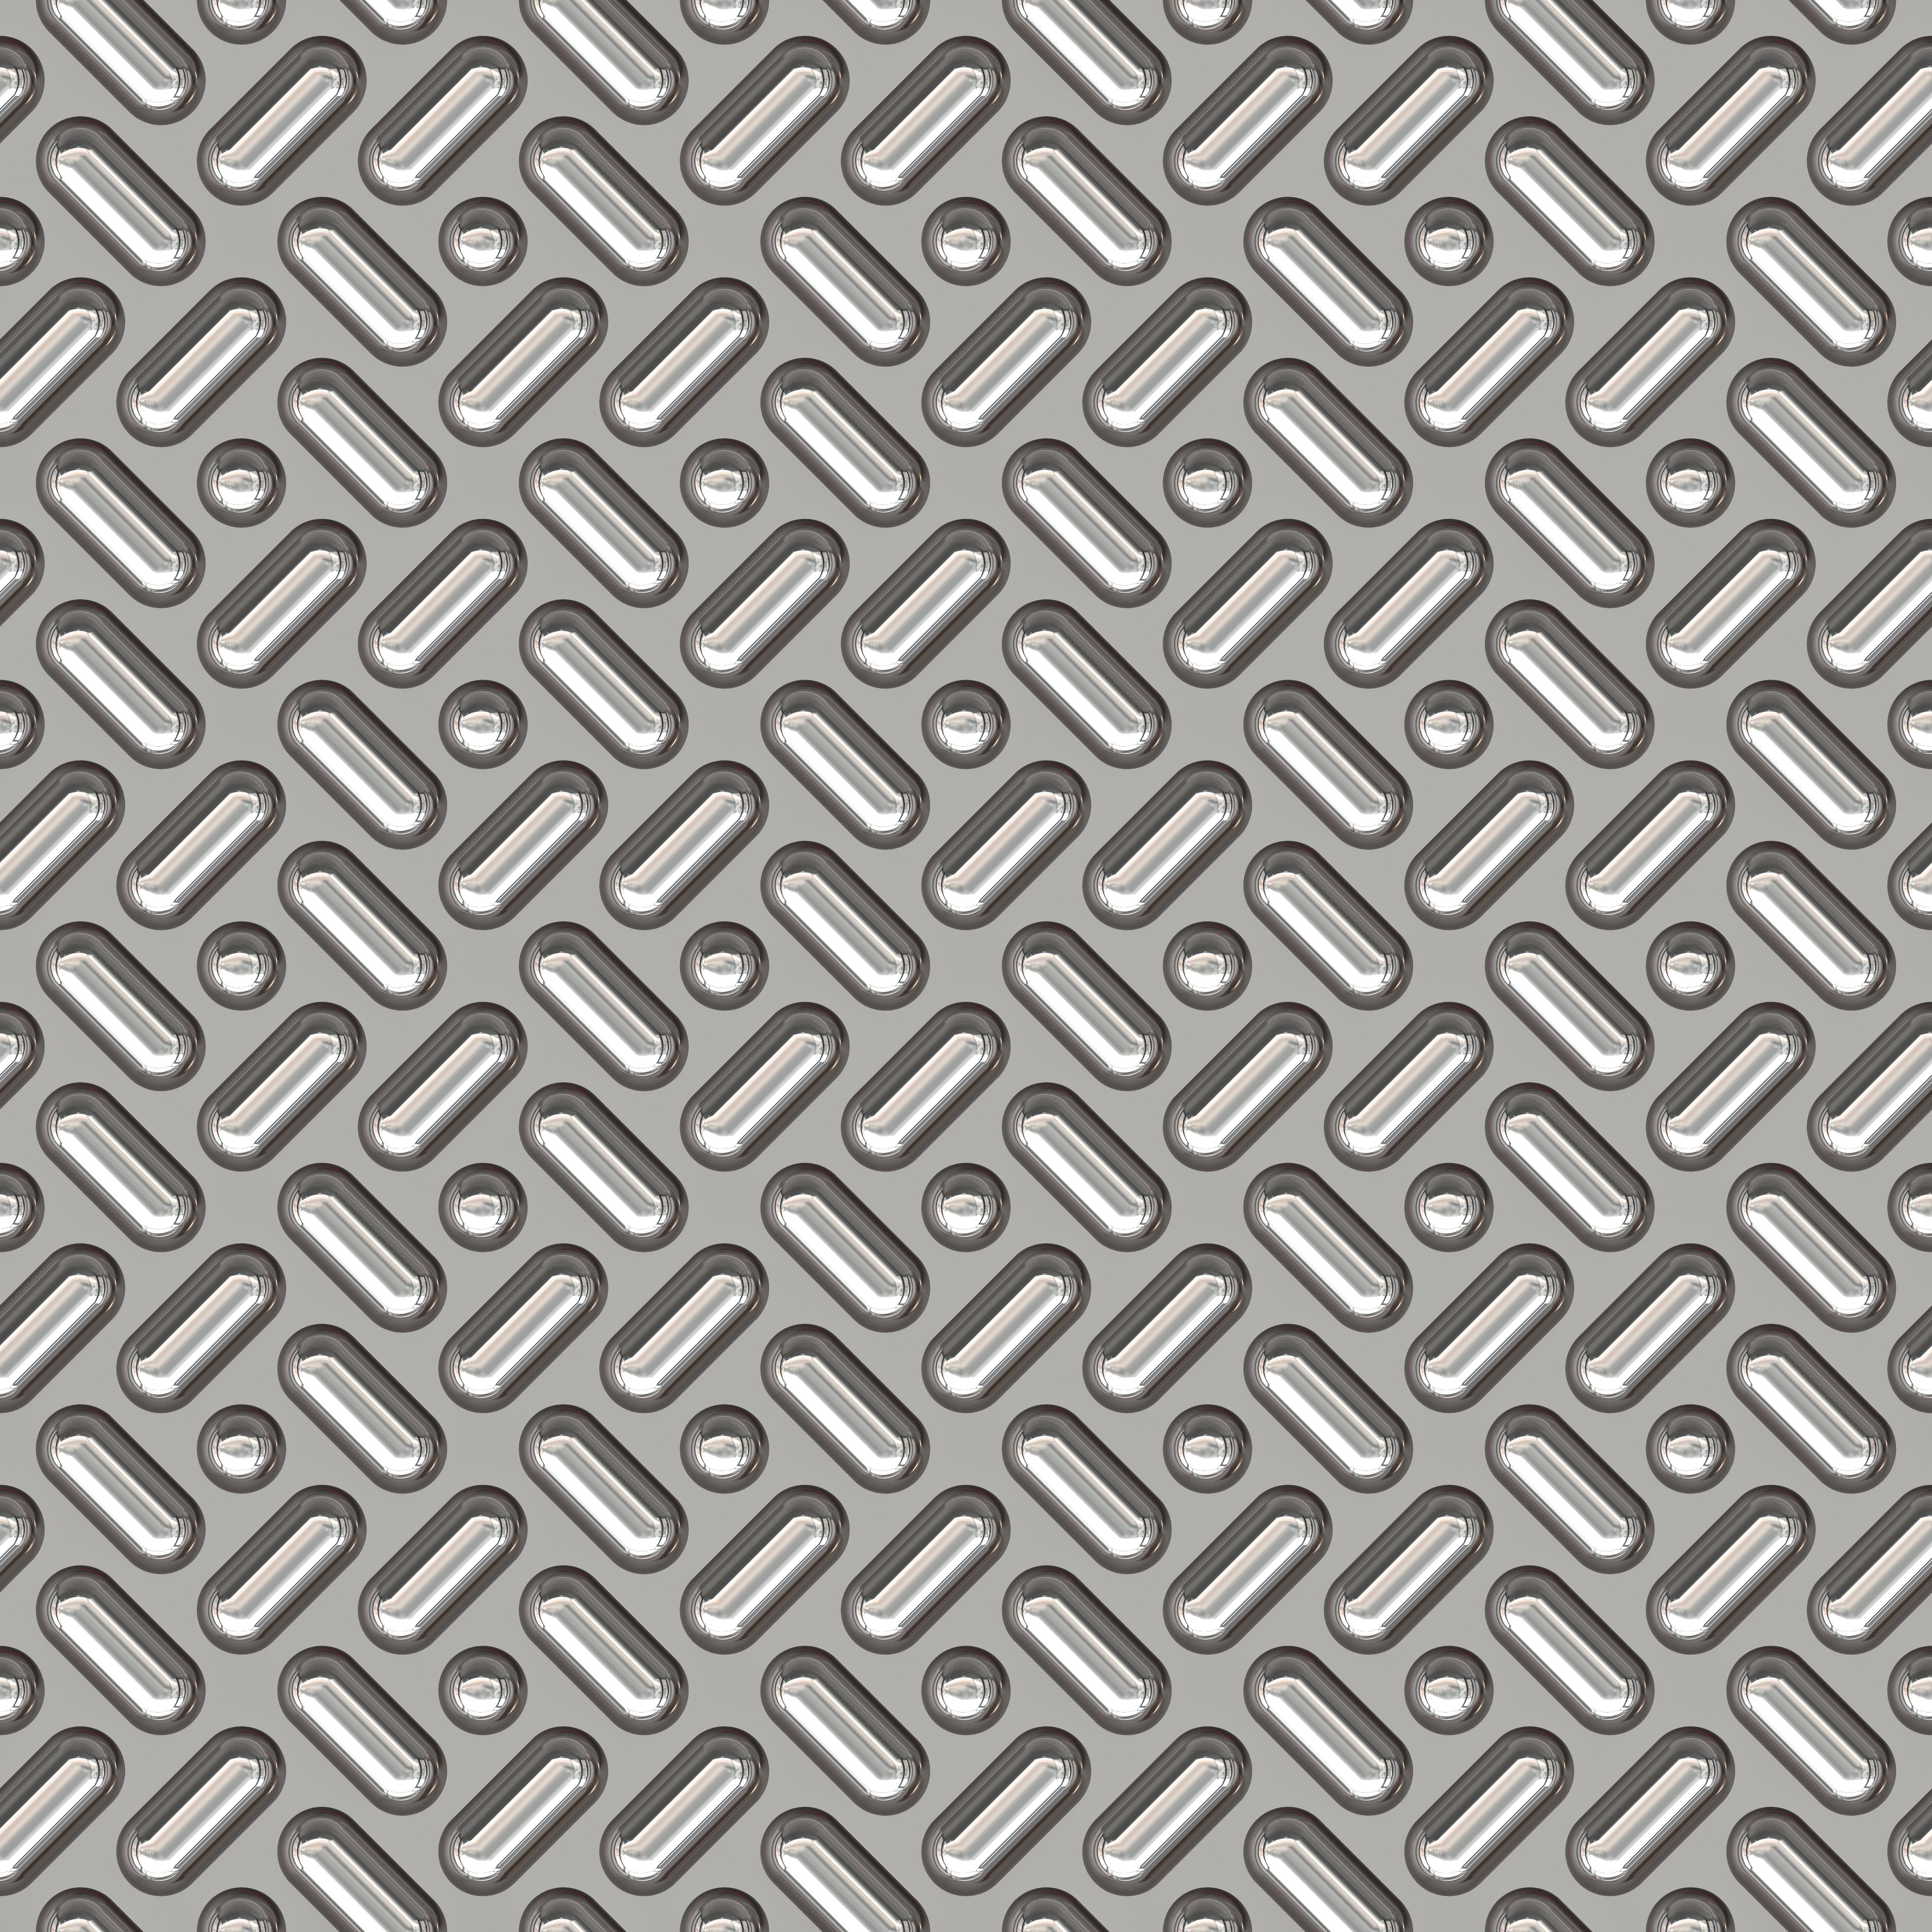 grey metal diamond plate background texture wwwmyfreetexturescom 5000x5000